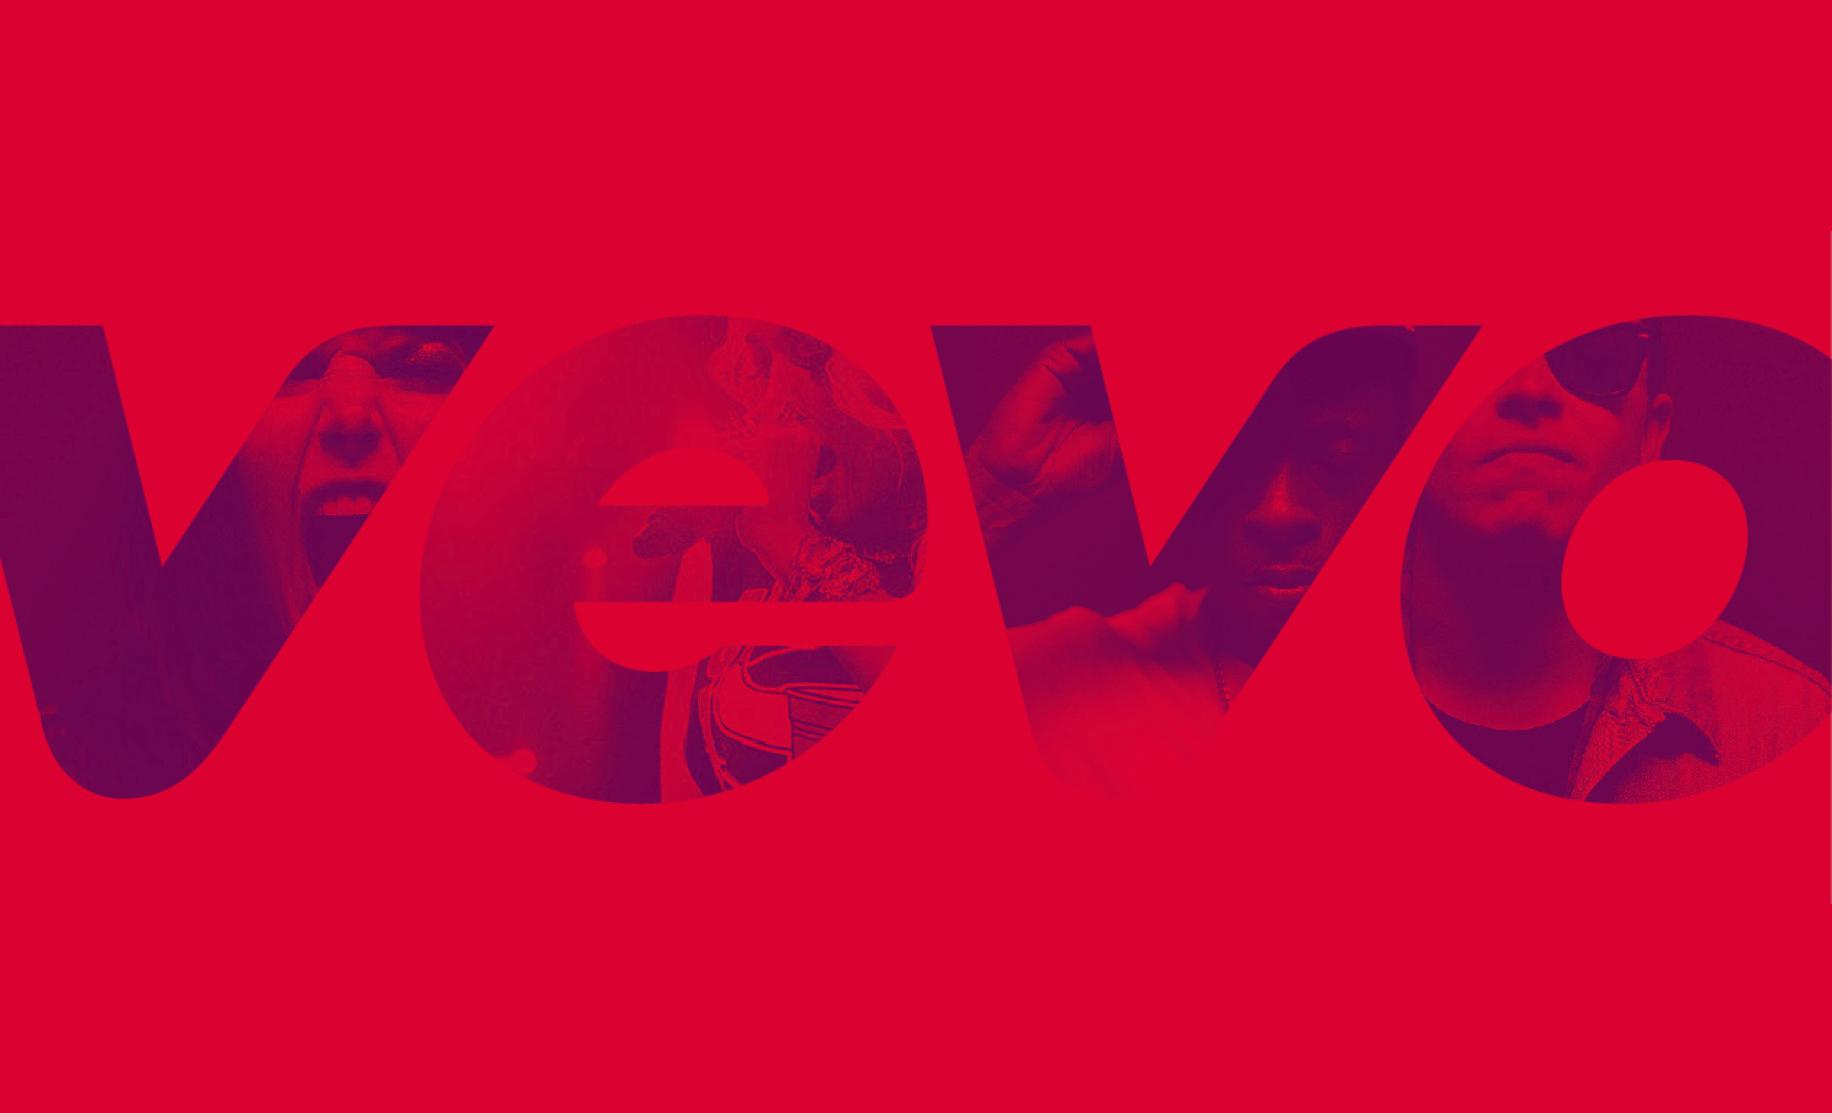 RED ANTLER VEVO LOGO RED